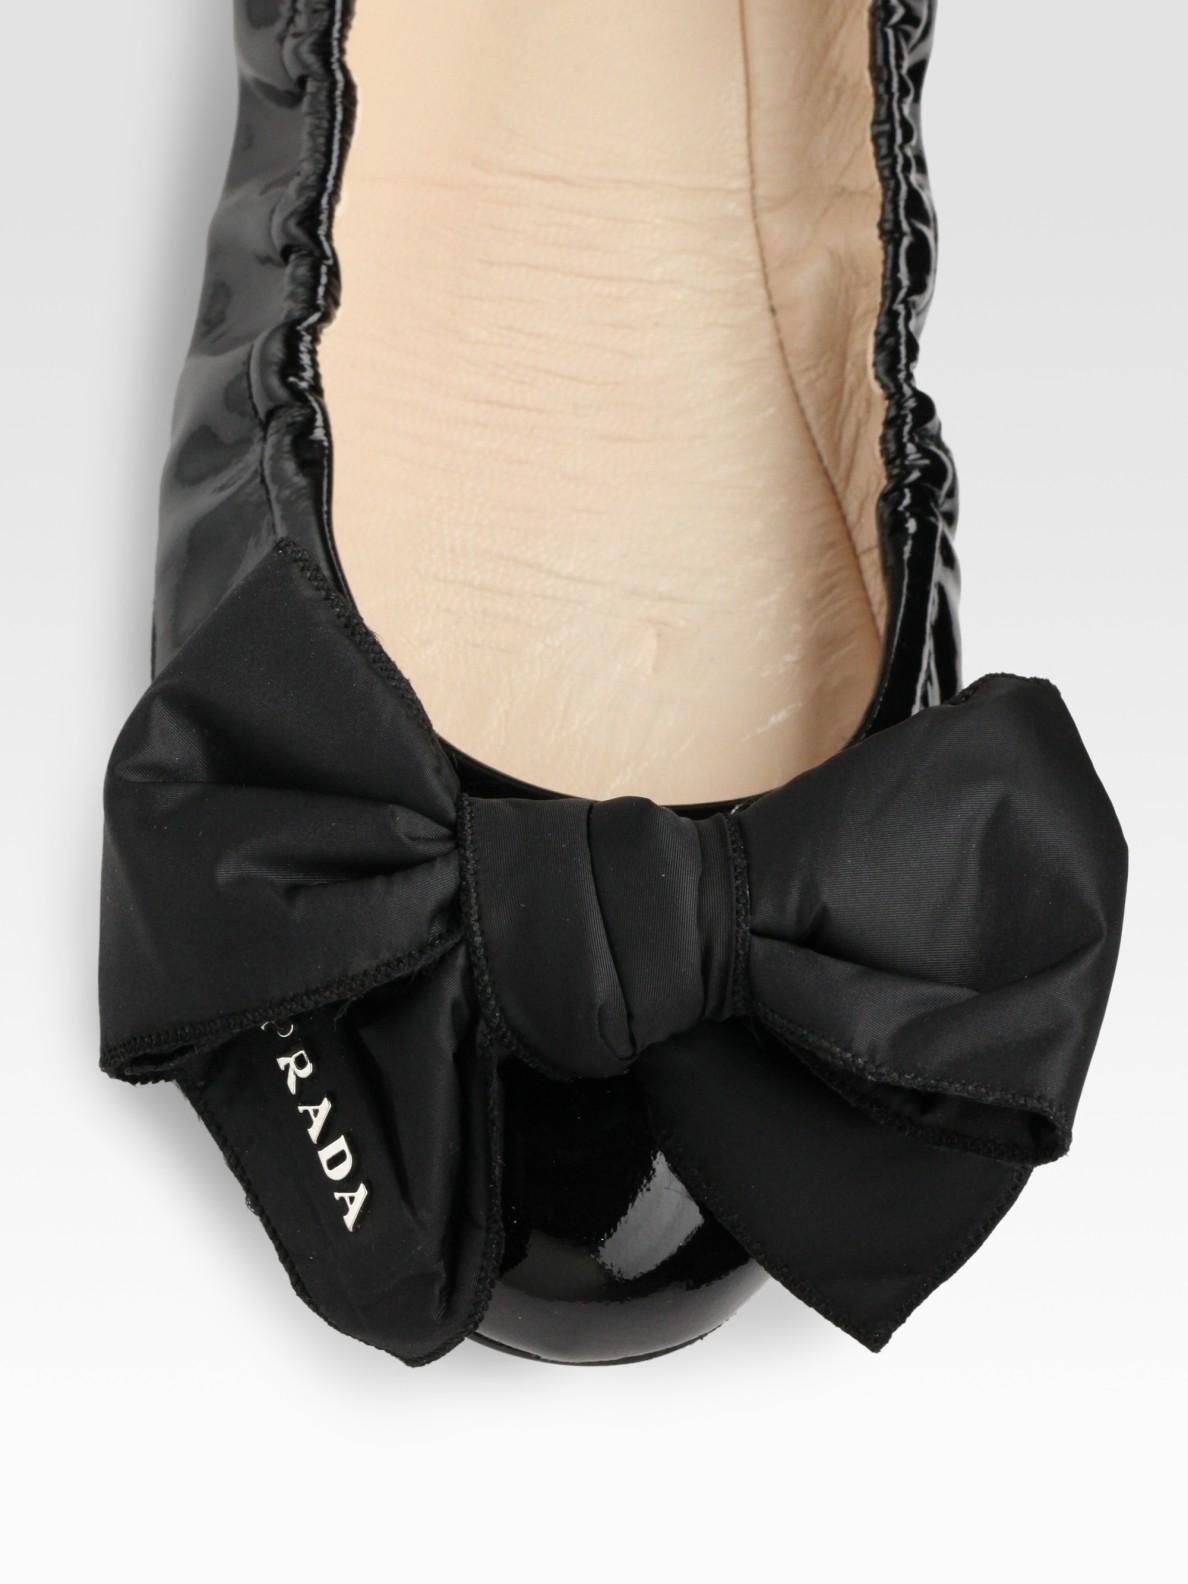 Prada Patent Leather Bow Ballet Flats